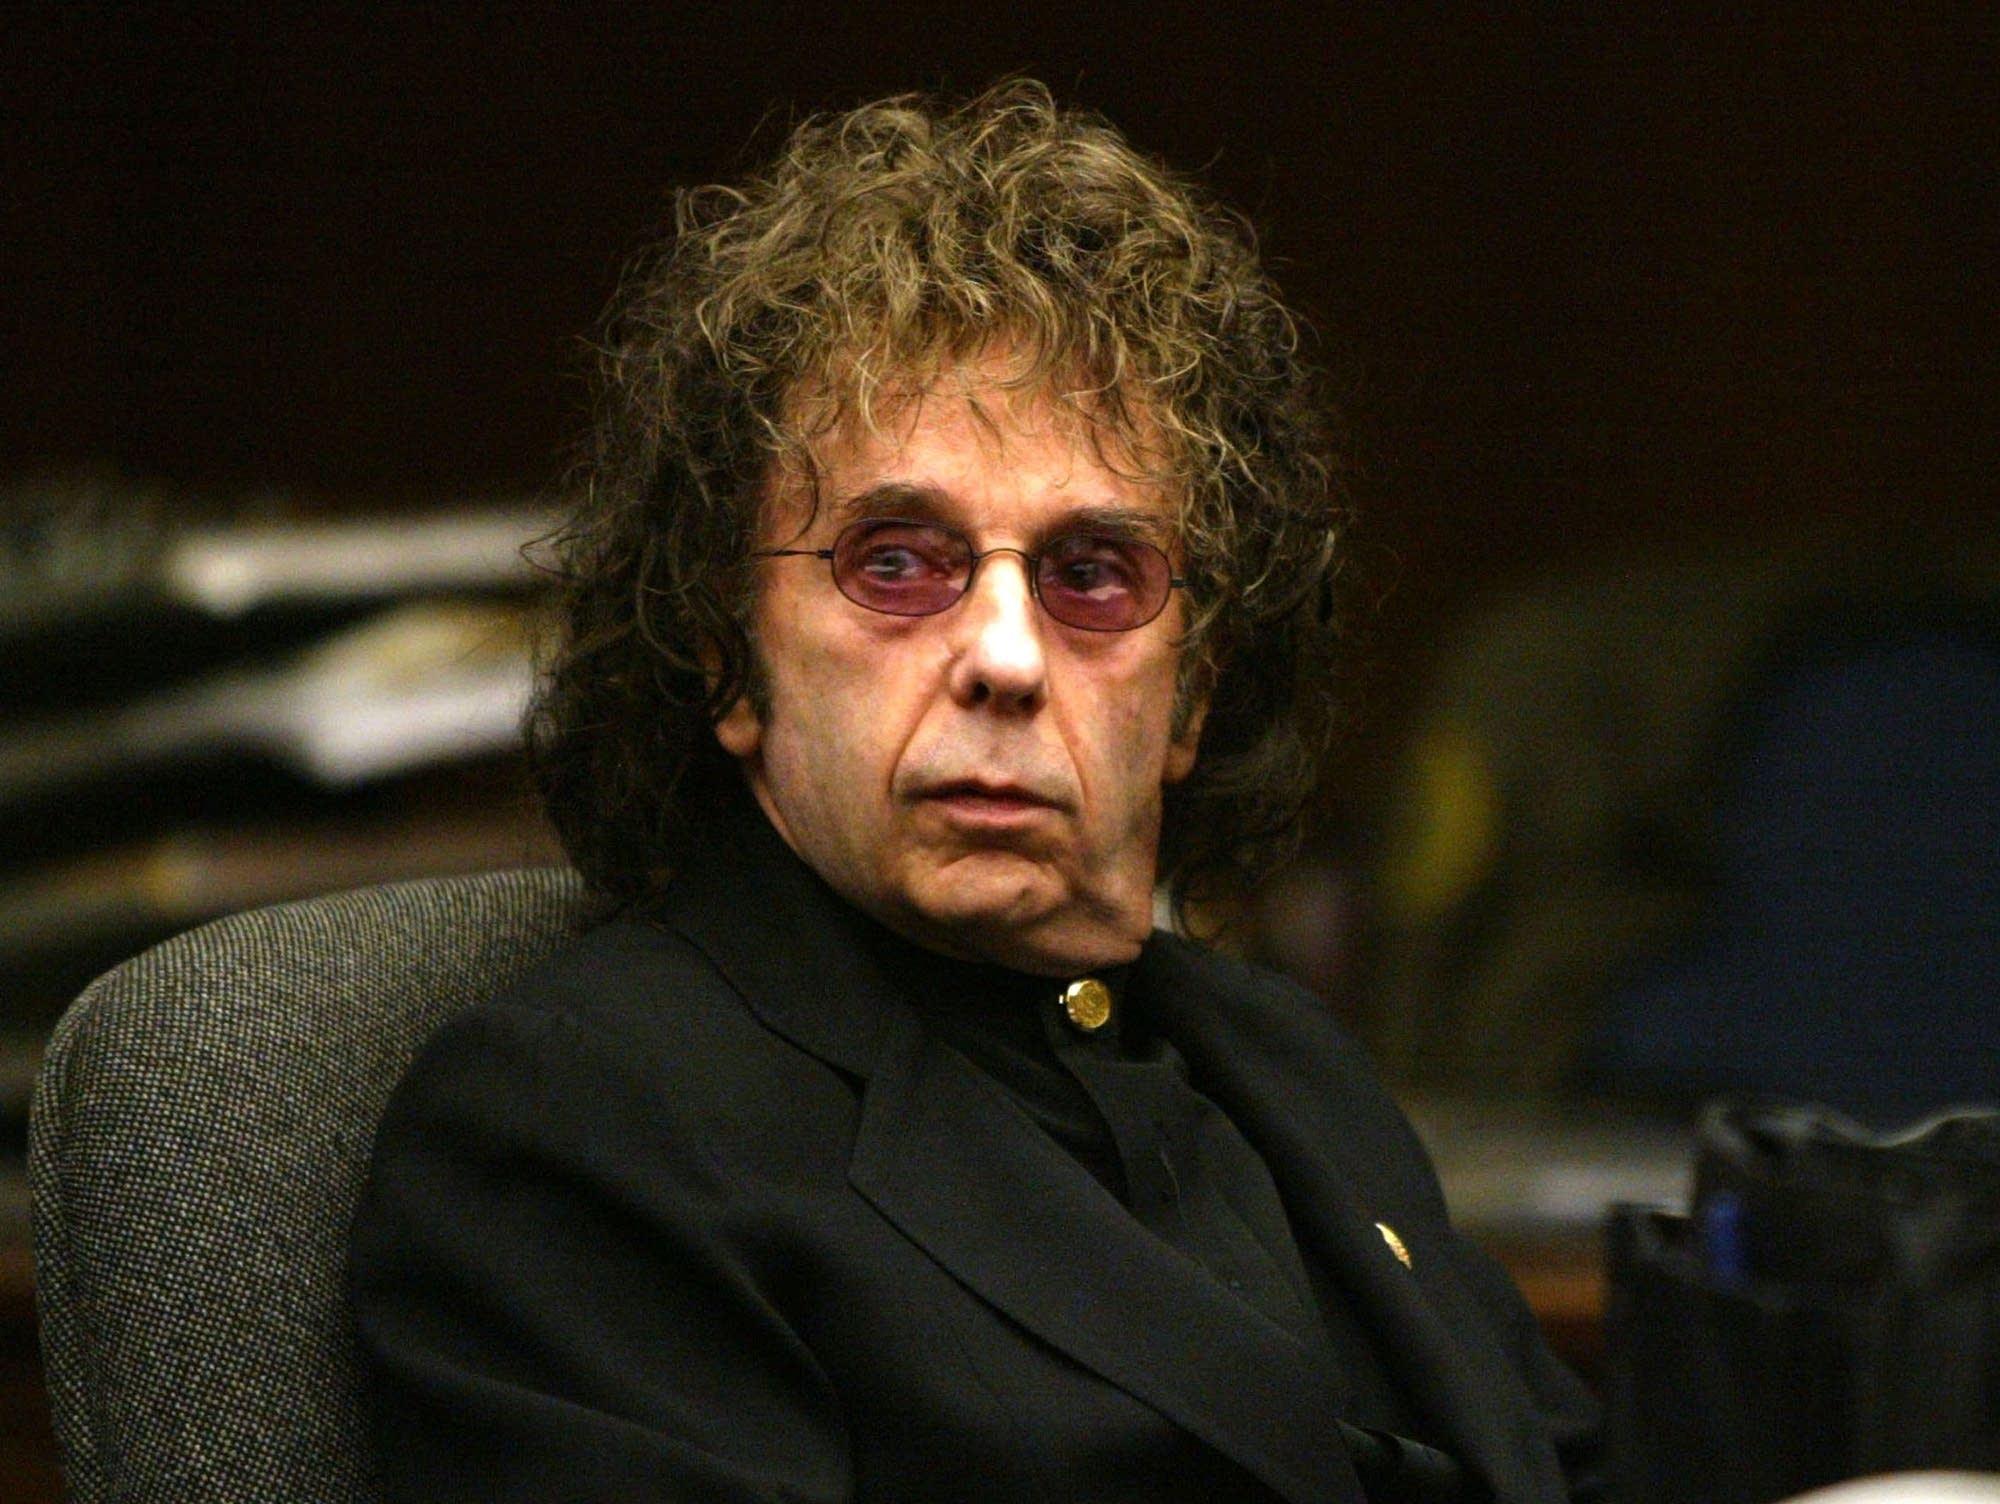 Phil Spector in court, 2004.